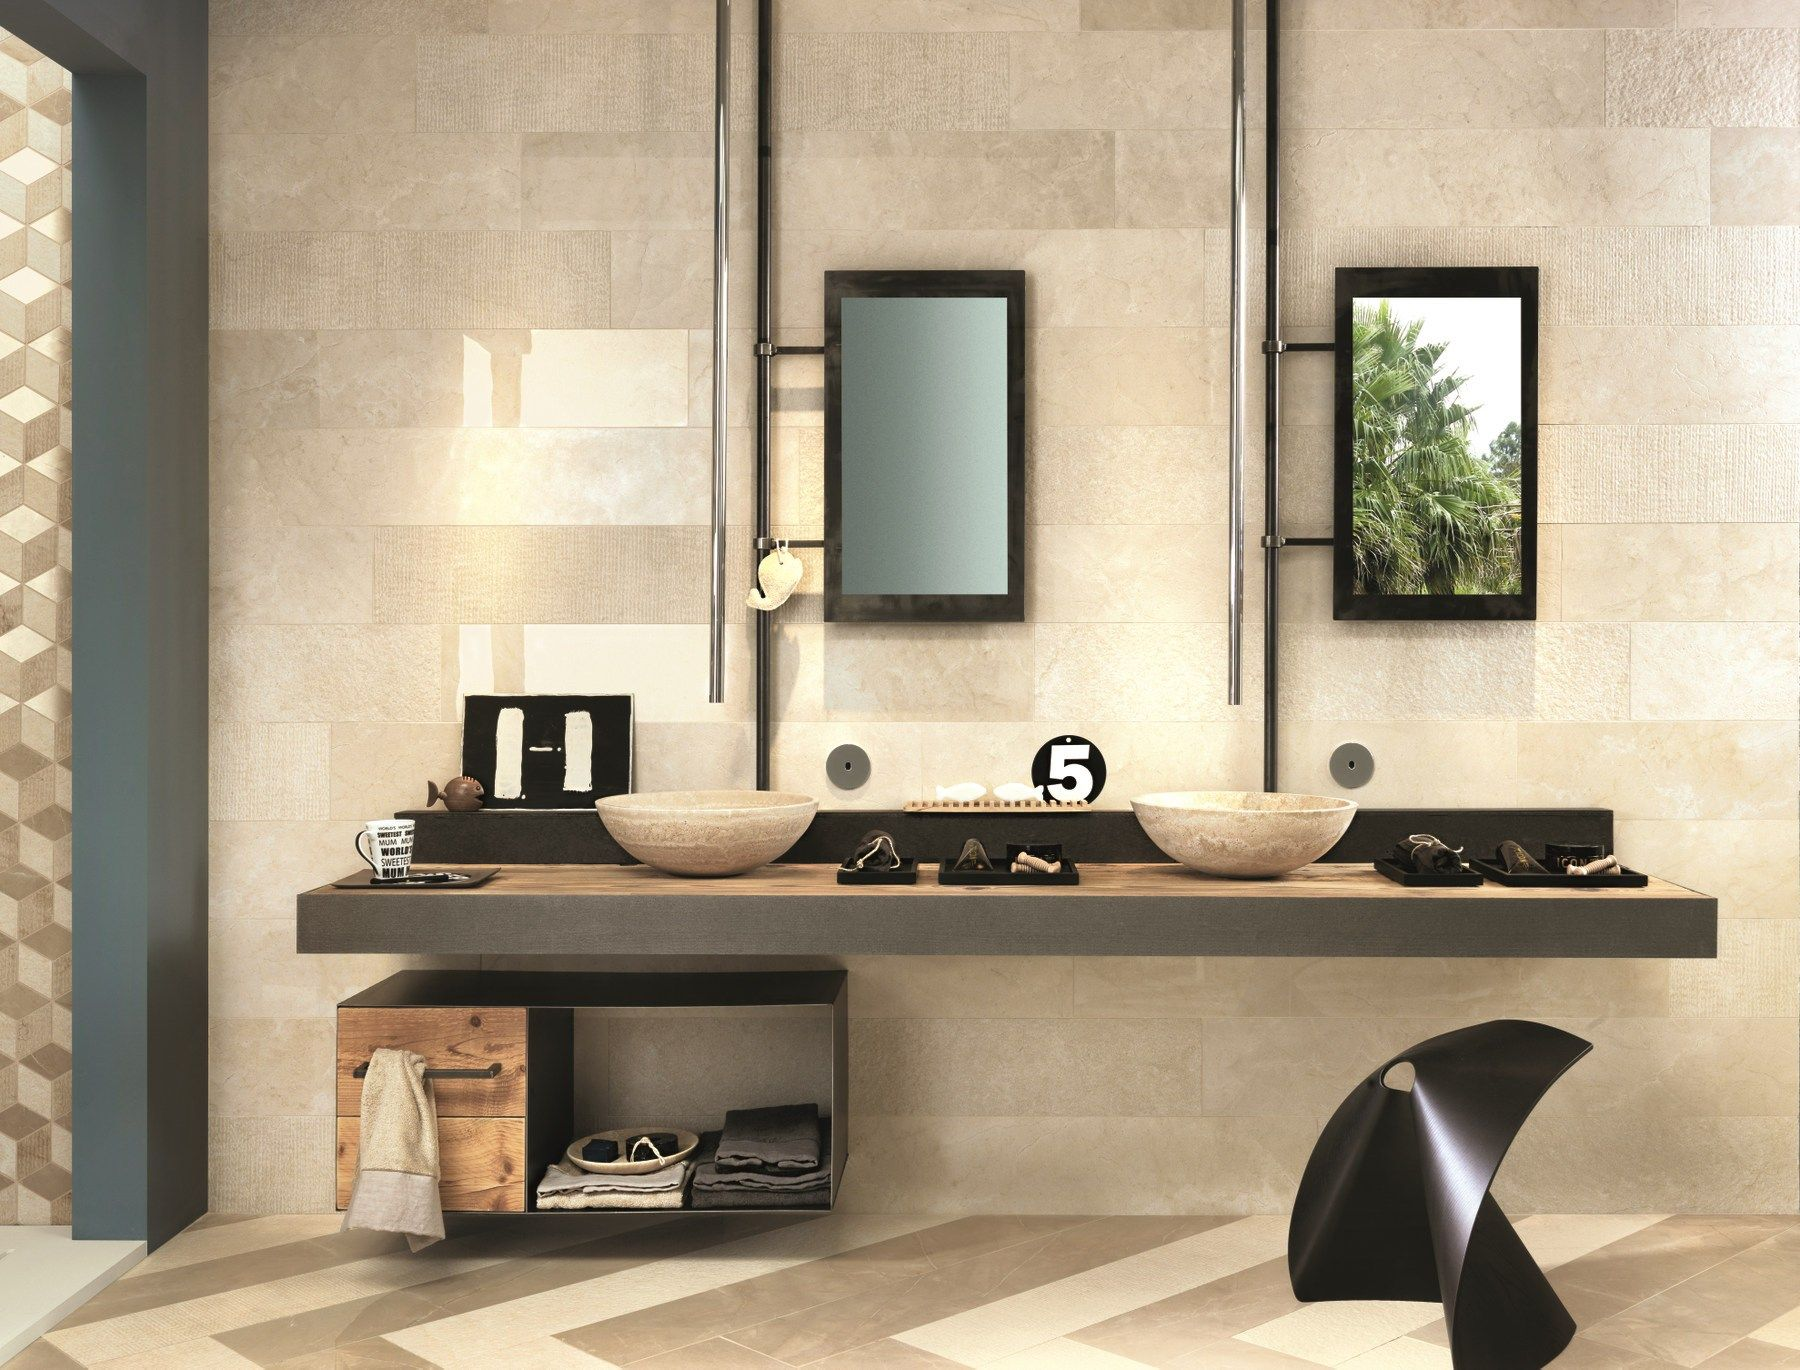 Tips to Create Salle De Bain Ceramique Beige